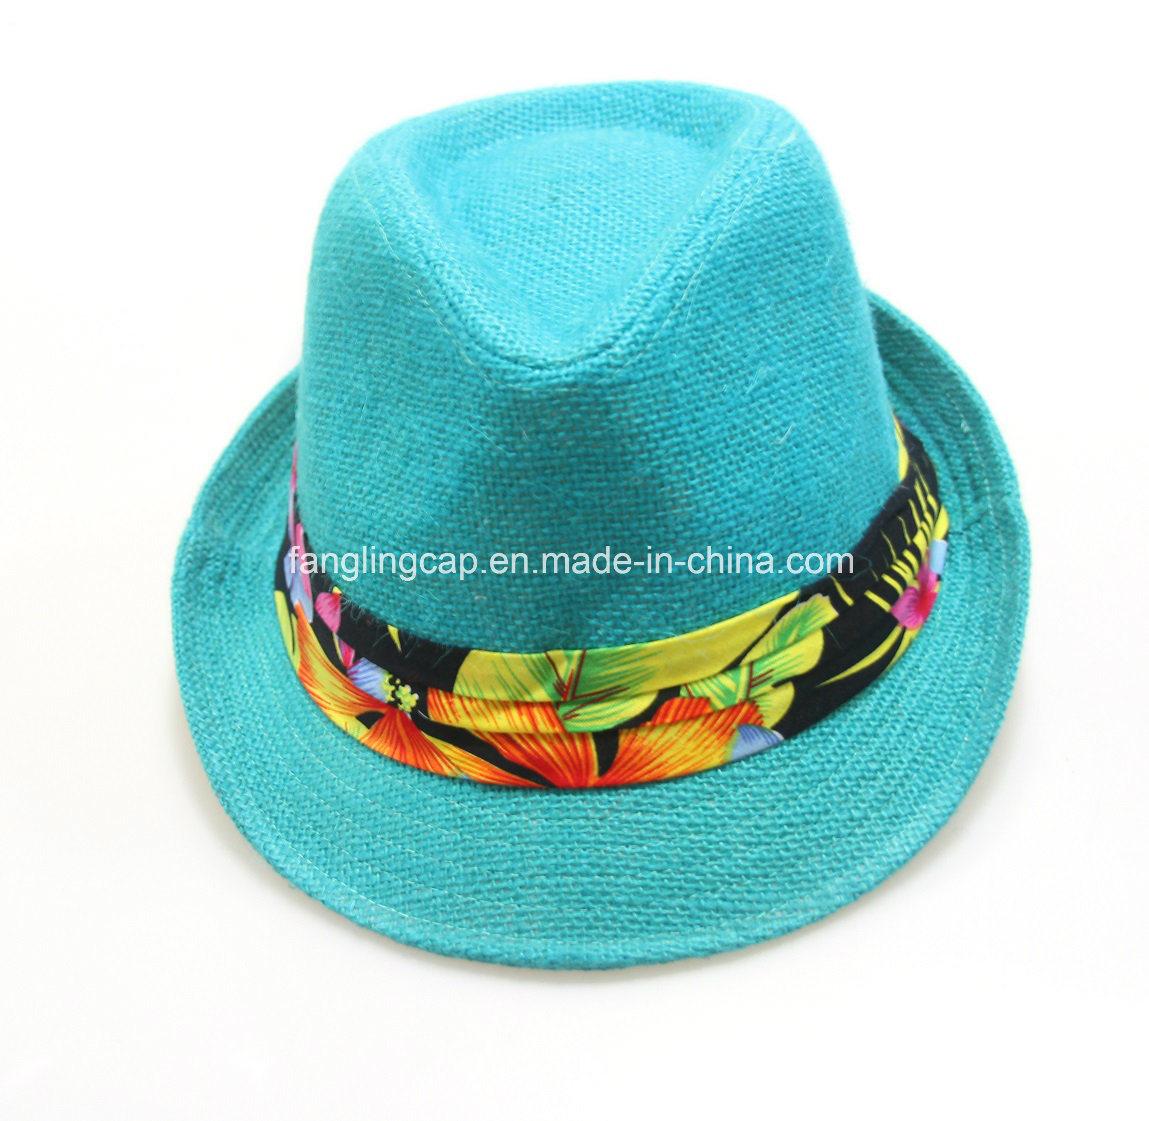 China Summer Straw Women Hats Fashion Decorate Unisex Paper Fedora Hat -  China Hat 06cef3ab6db